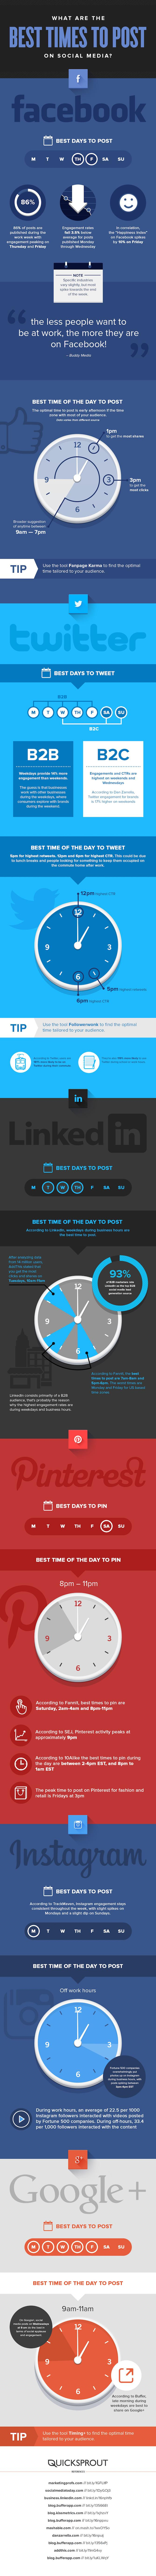 best-posting-times-social-media